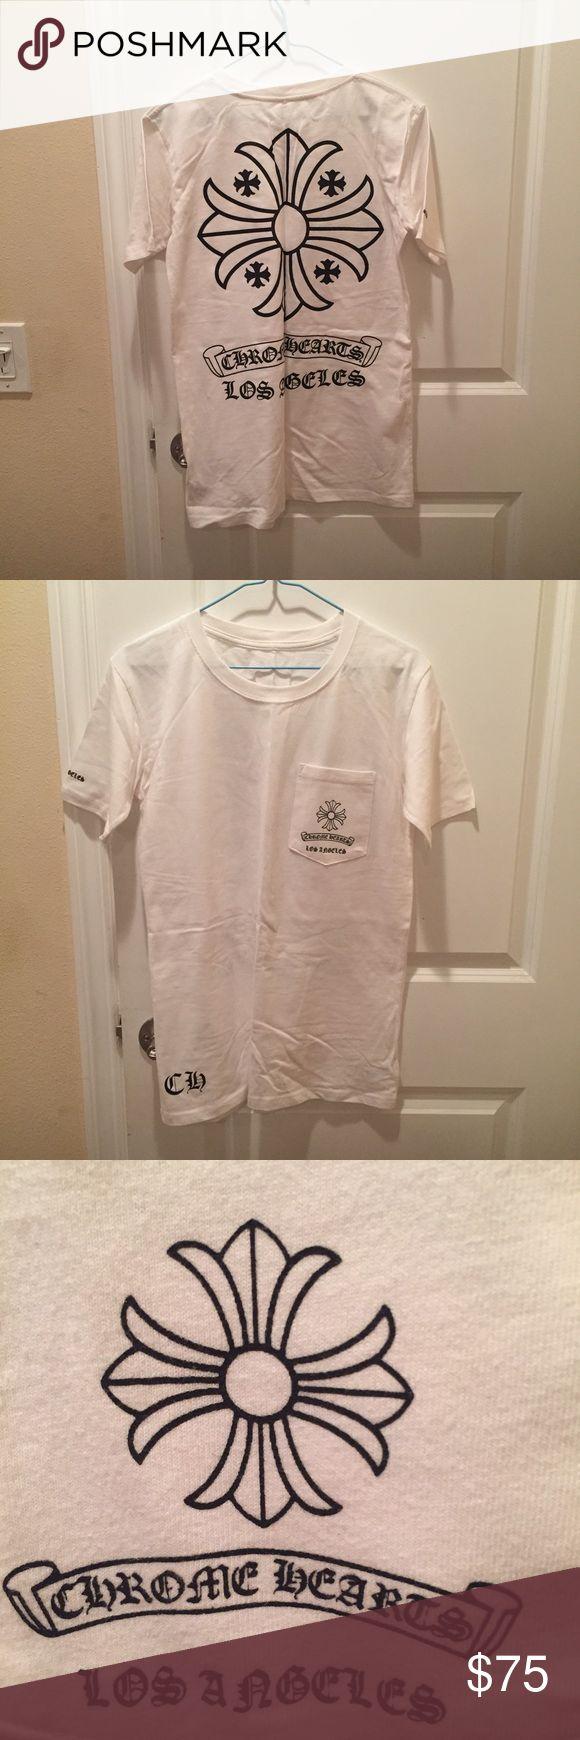 Chrome Hearts Shirt Clearance sale! Chrome Hearts Tops